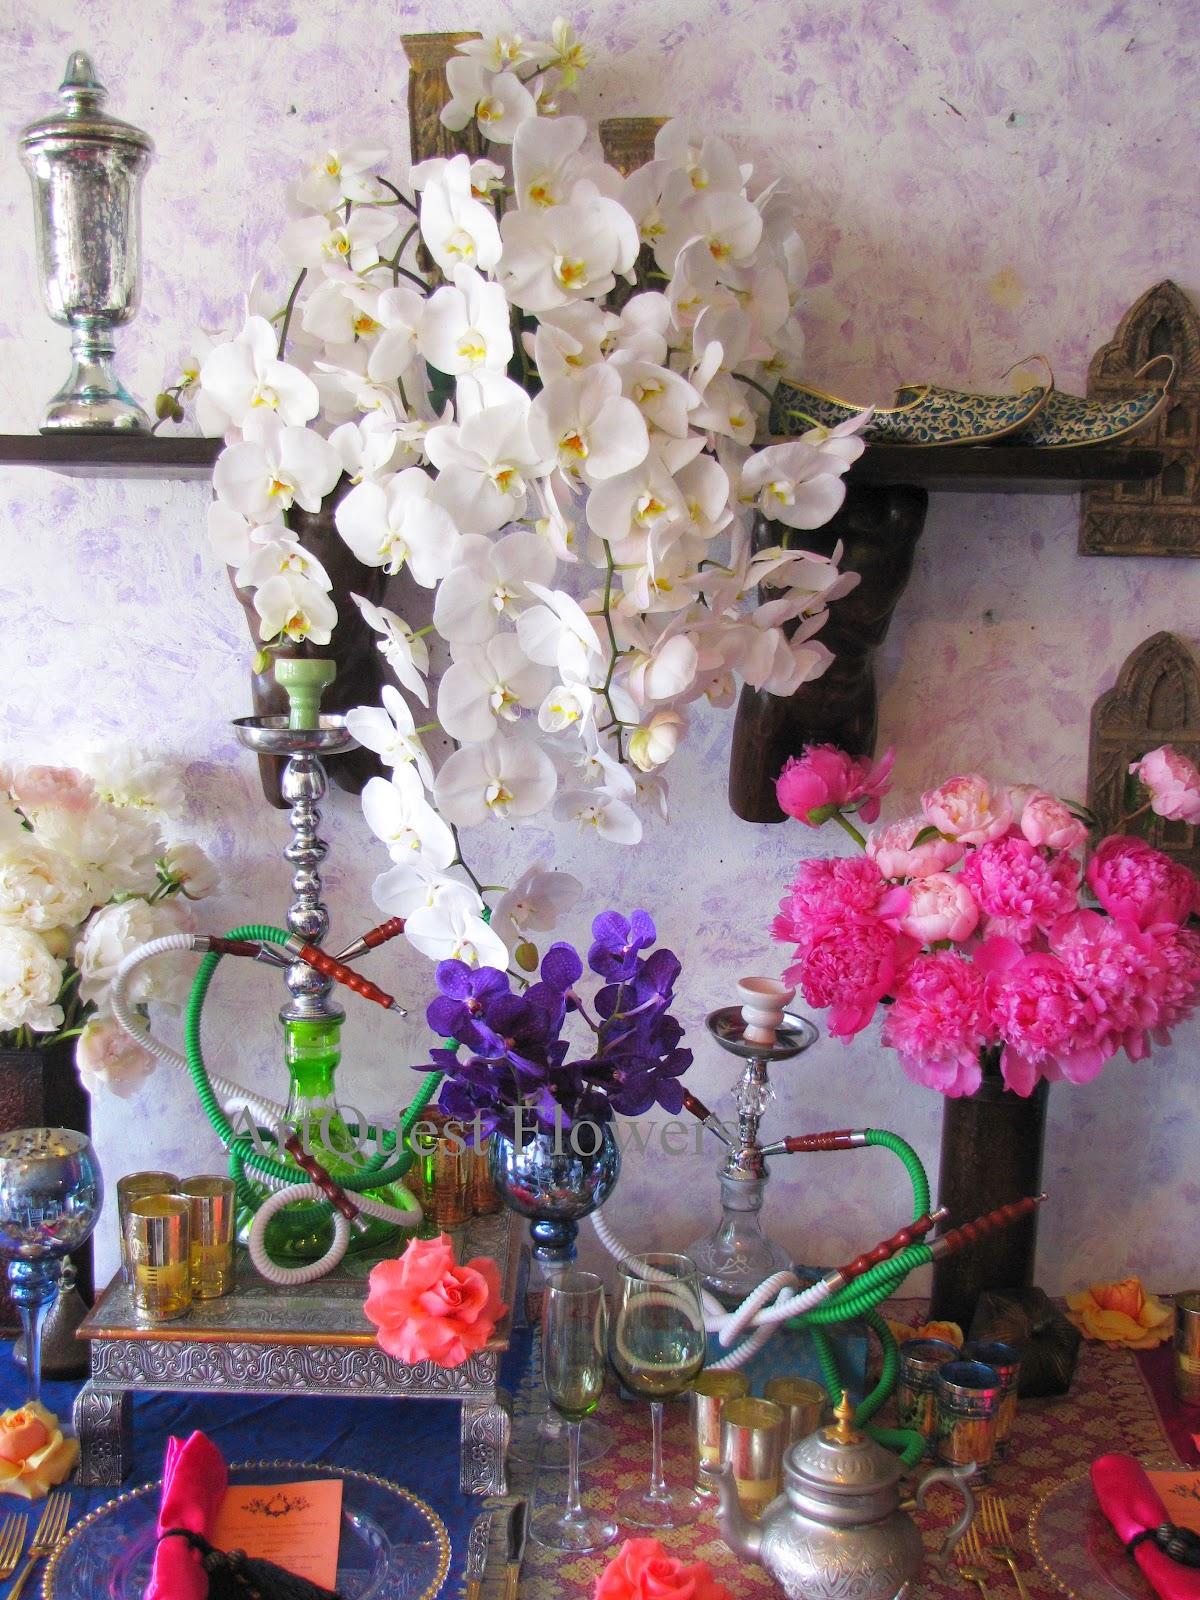 12_White Orchids.JPG